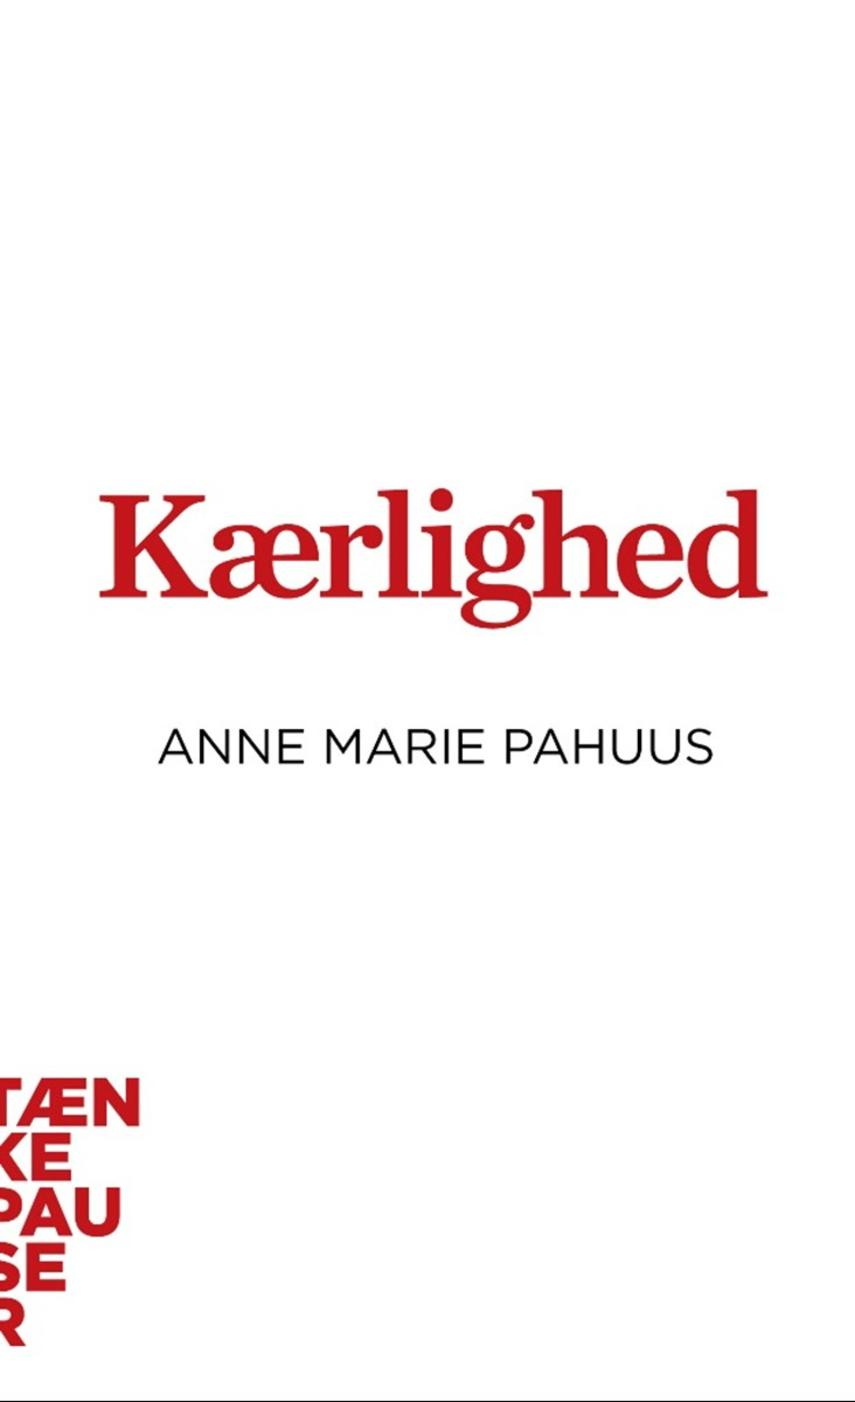 Anne Marie Pahuus: Kærlighed